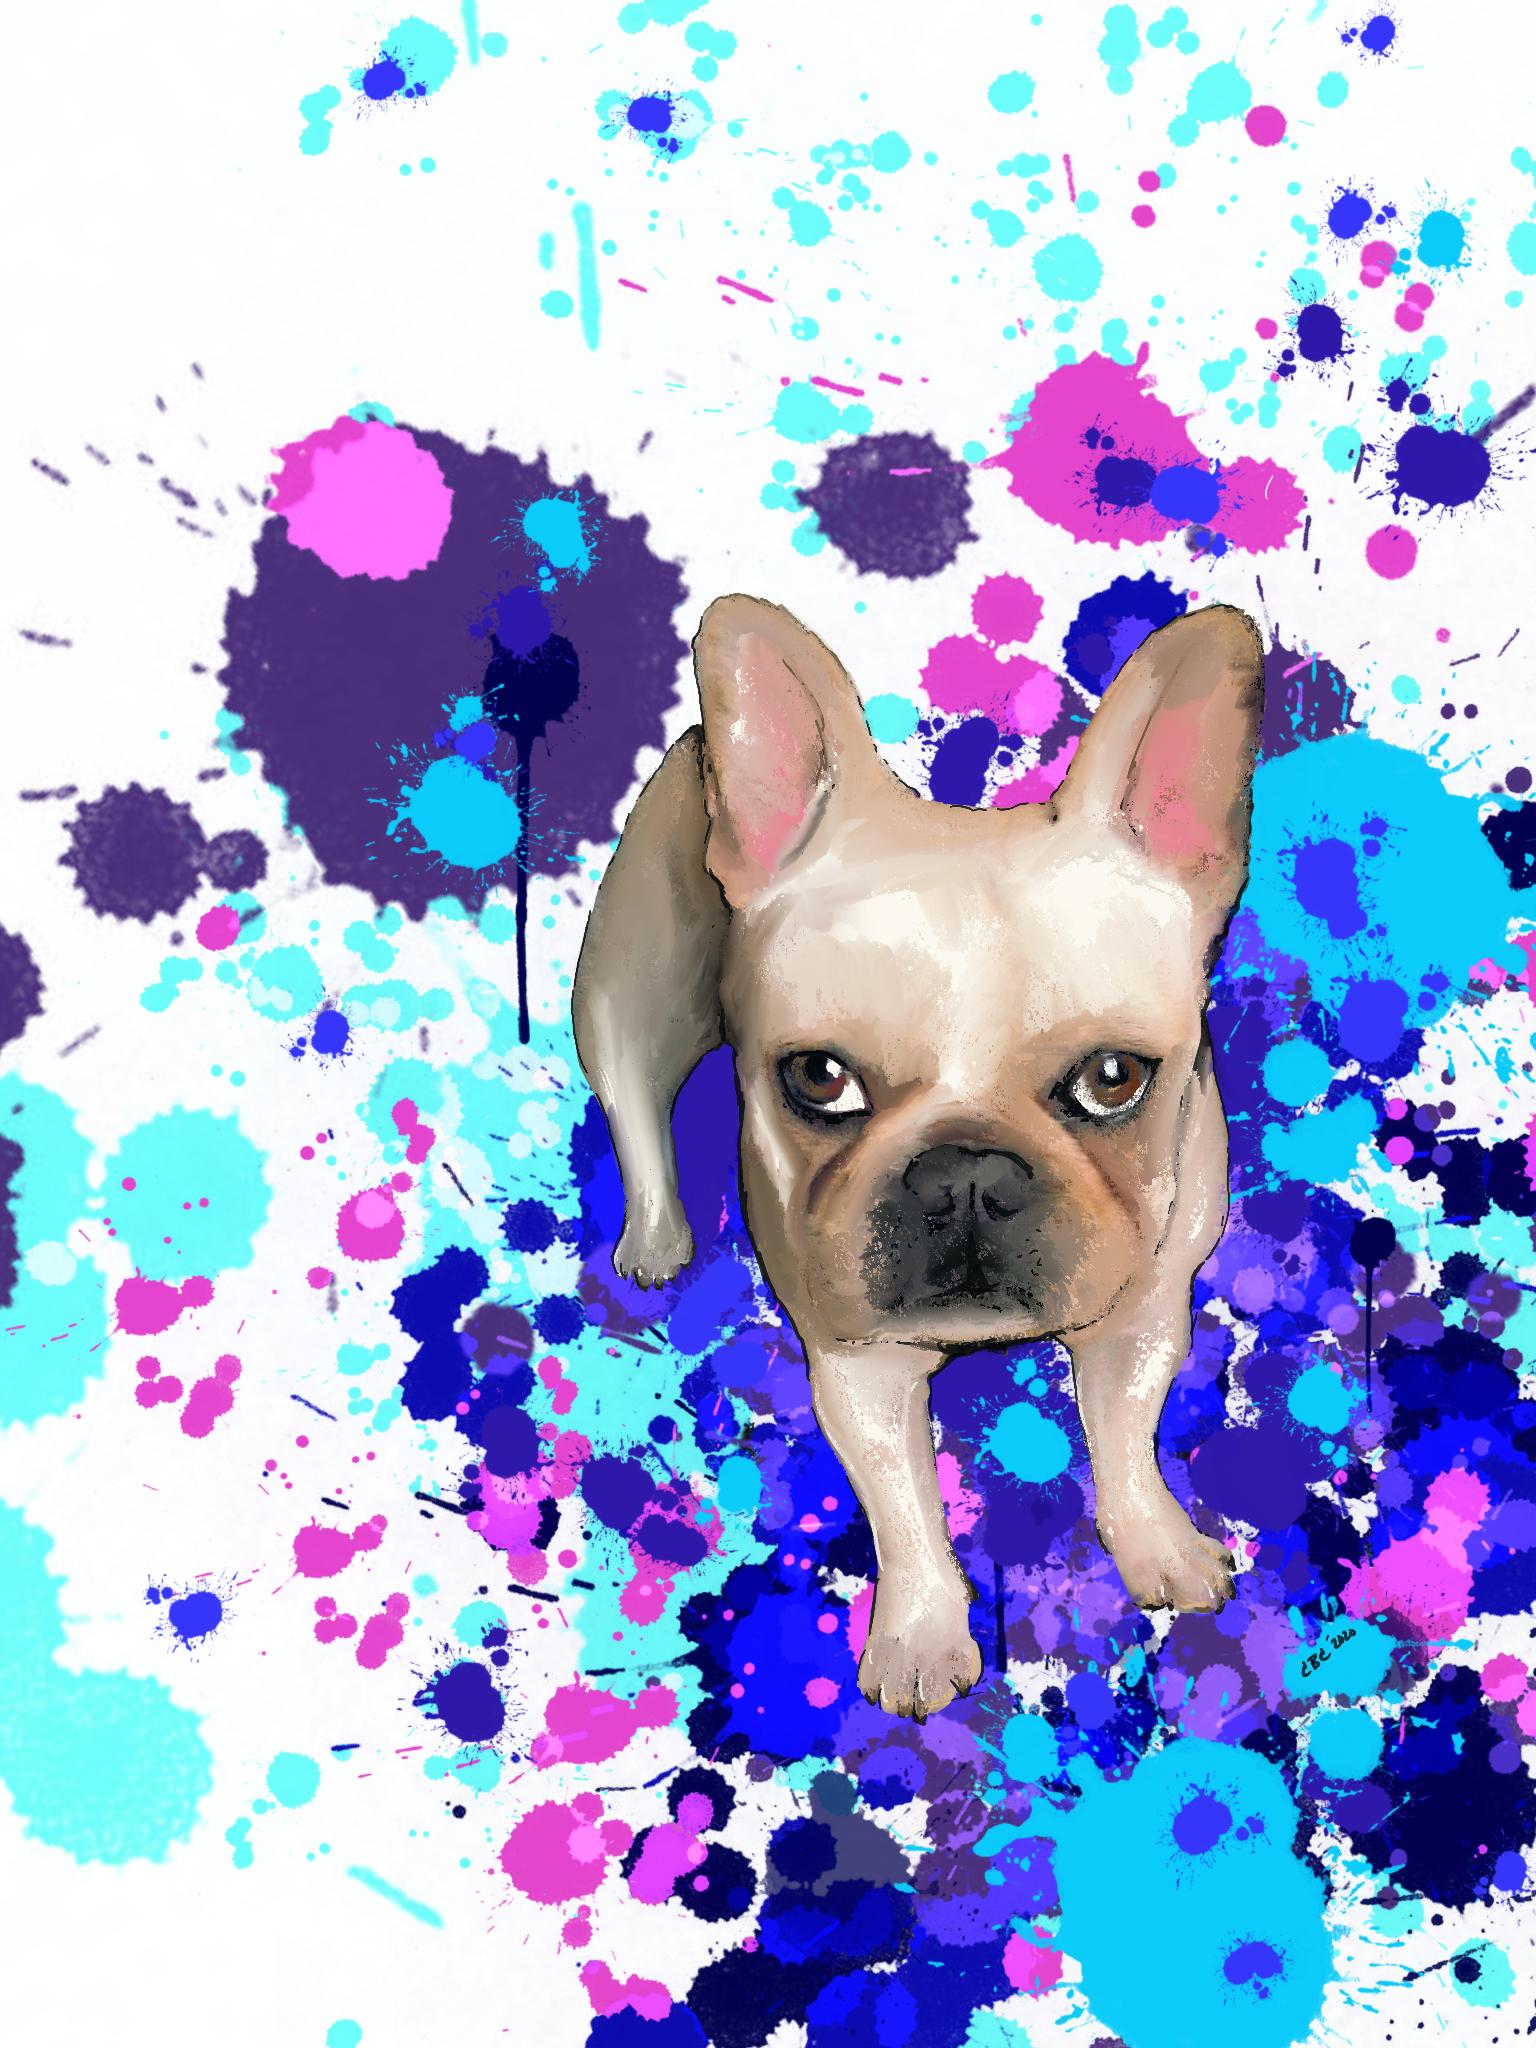 Pet Art by CBCInked